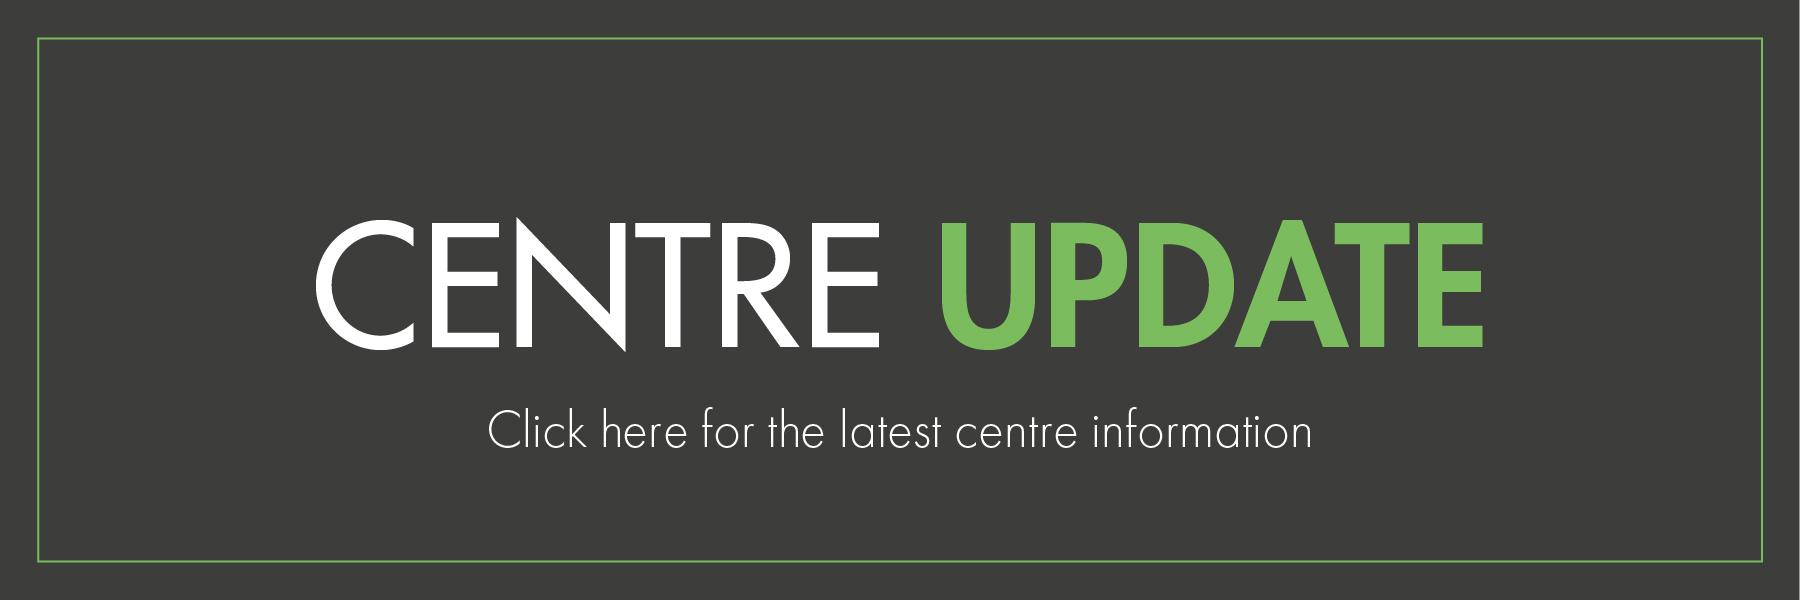 Centre Update